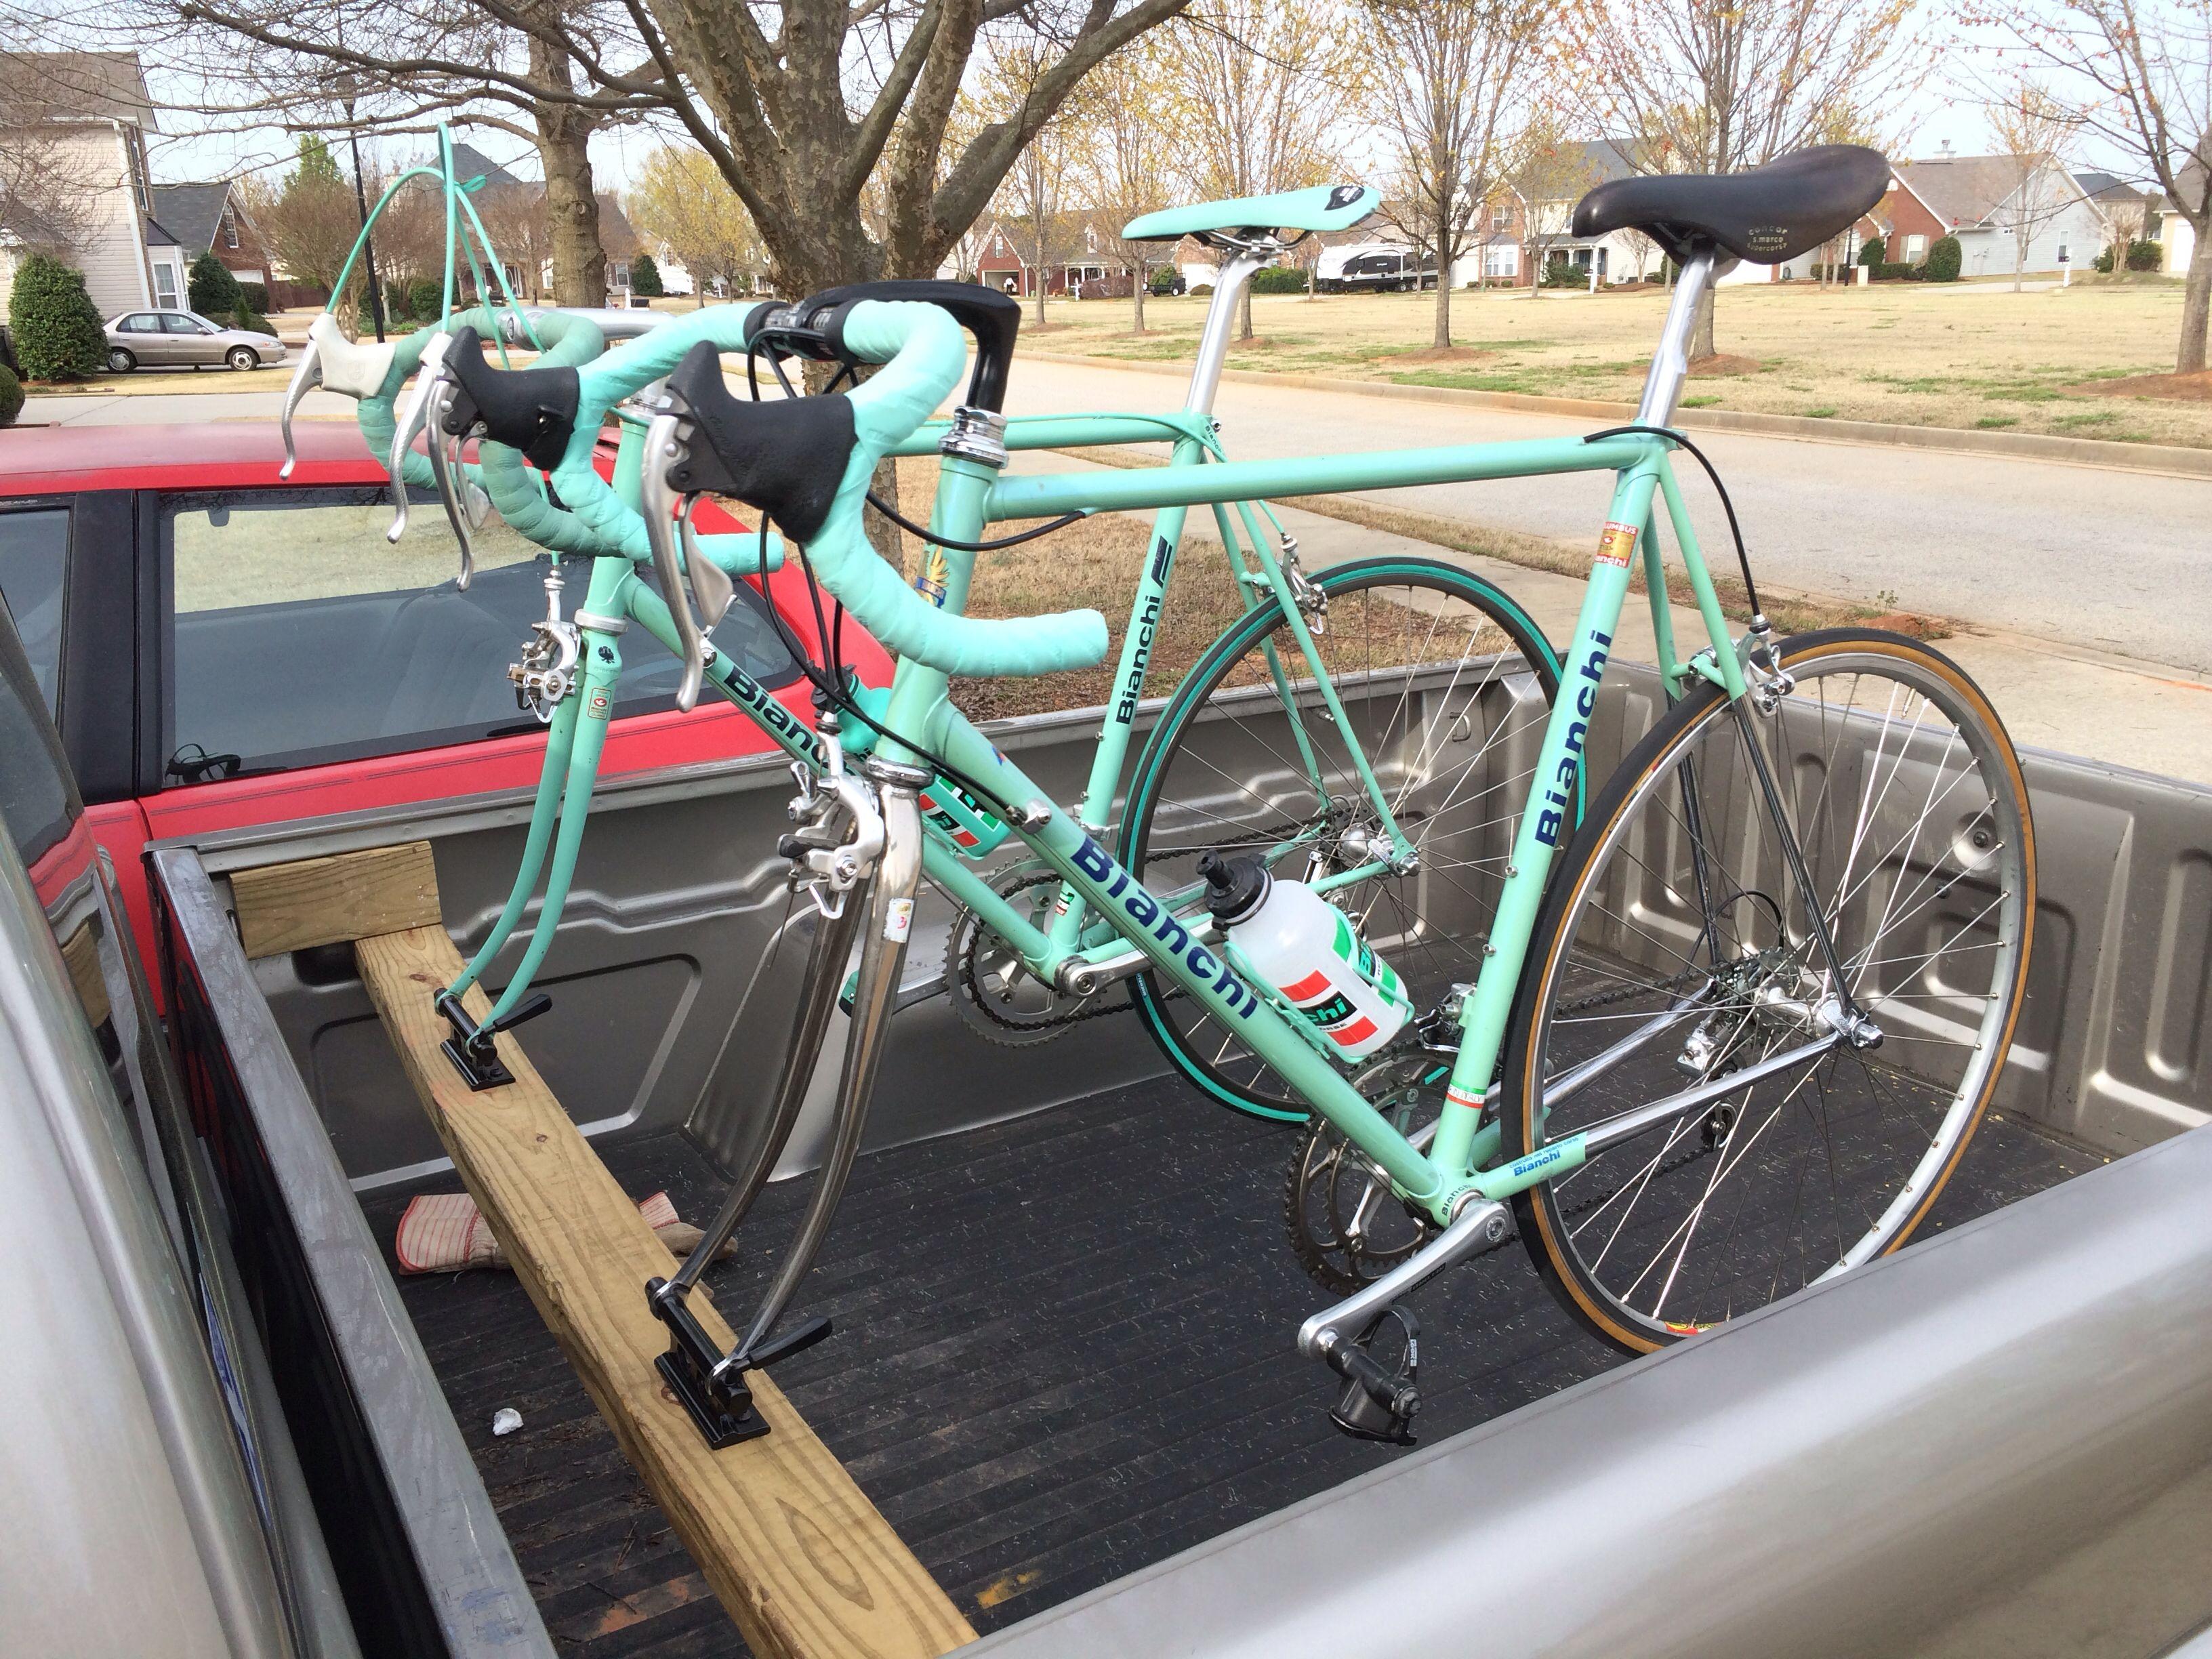 Truck mount bike rack.